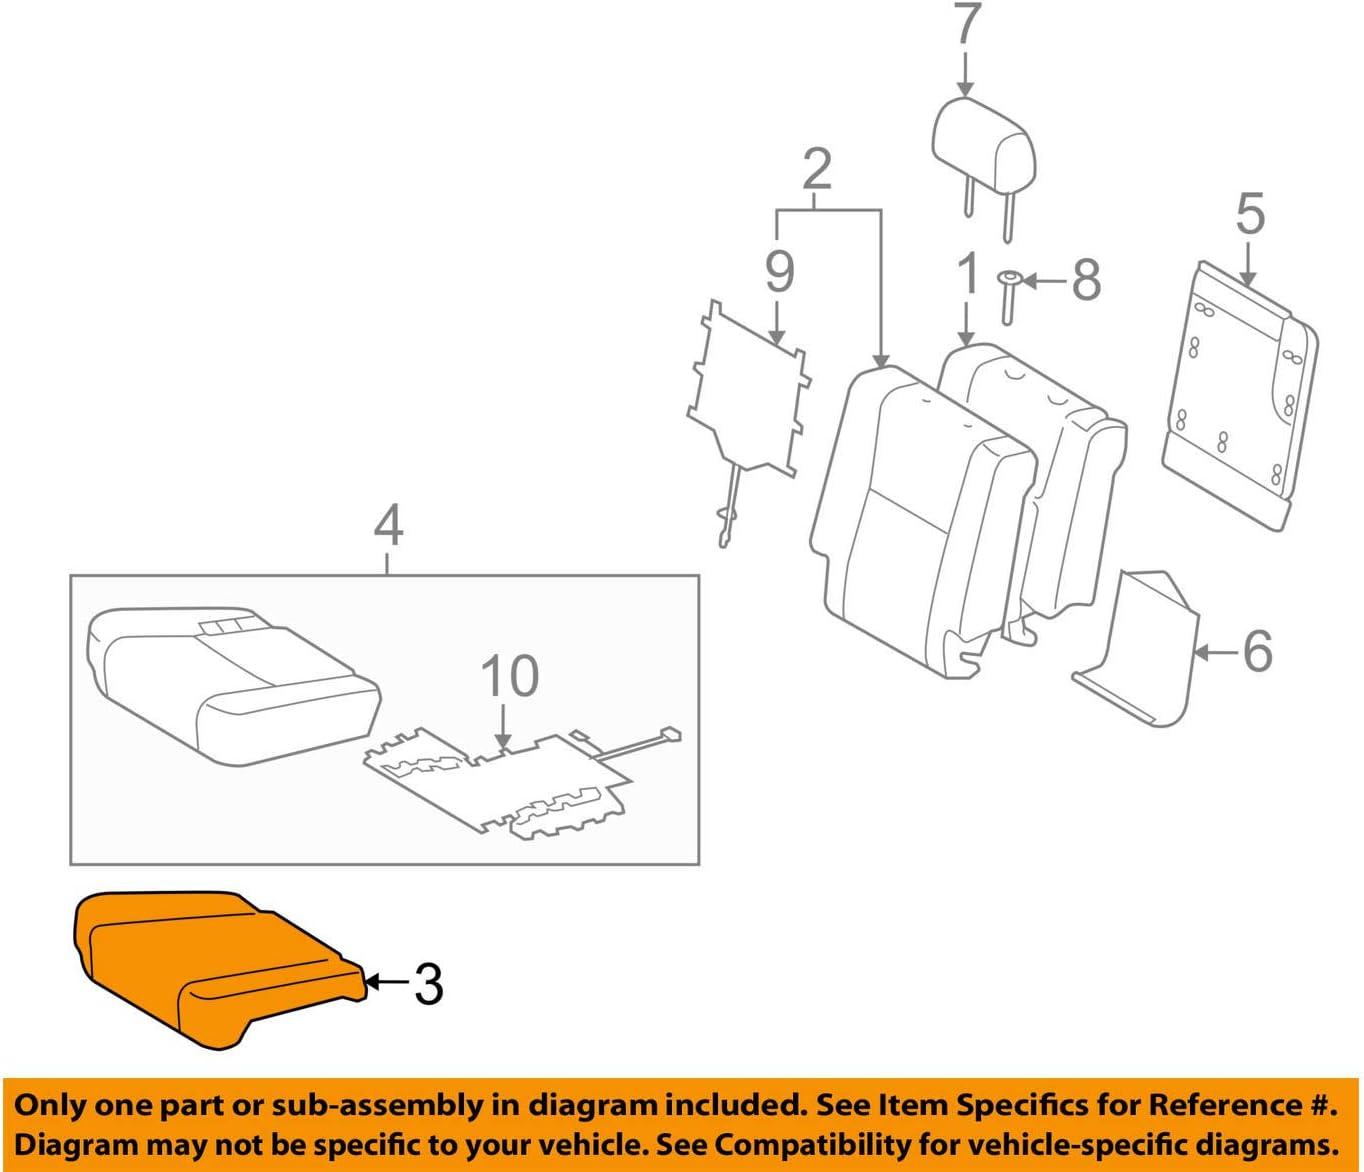 free shipping TOYOTA Genuine 71611-0C120 Pad Dealing full price reduction Seat Cushion